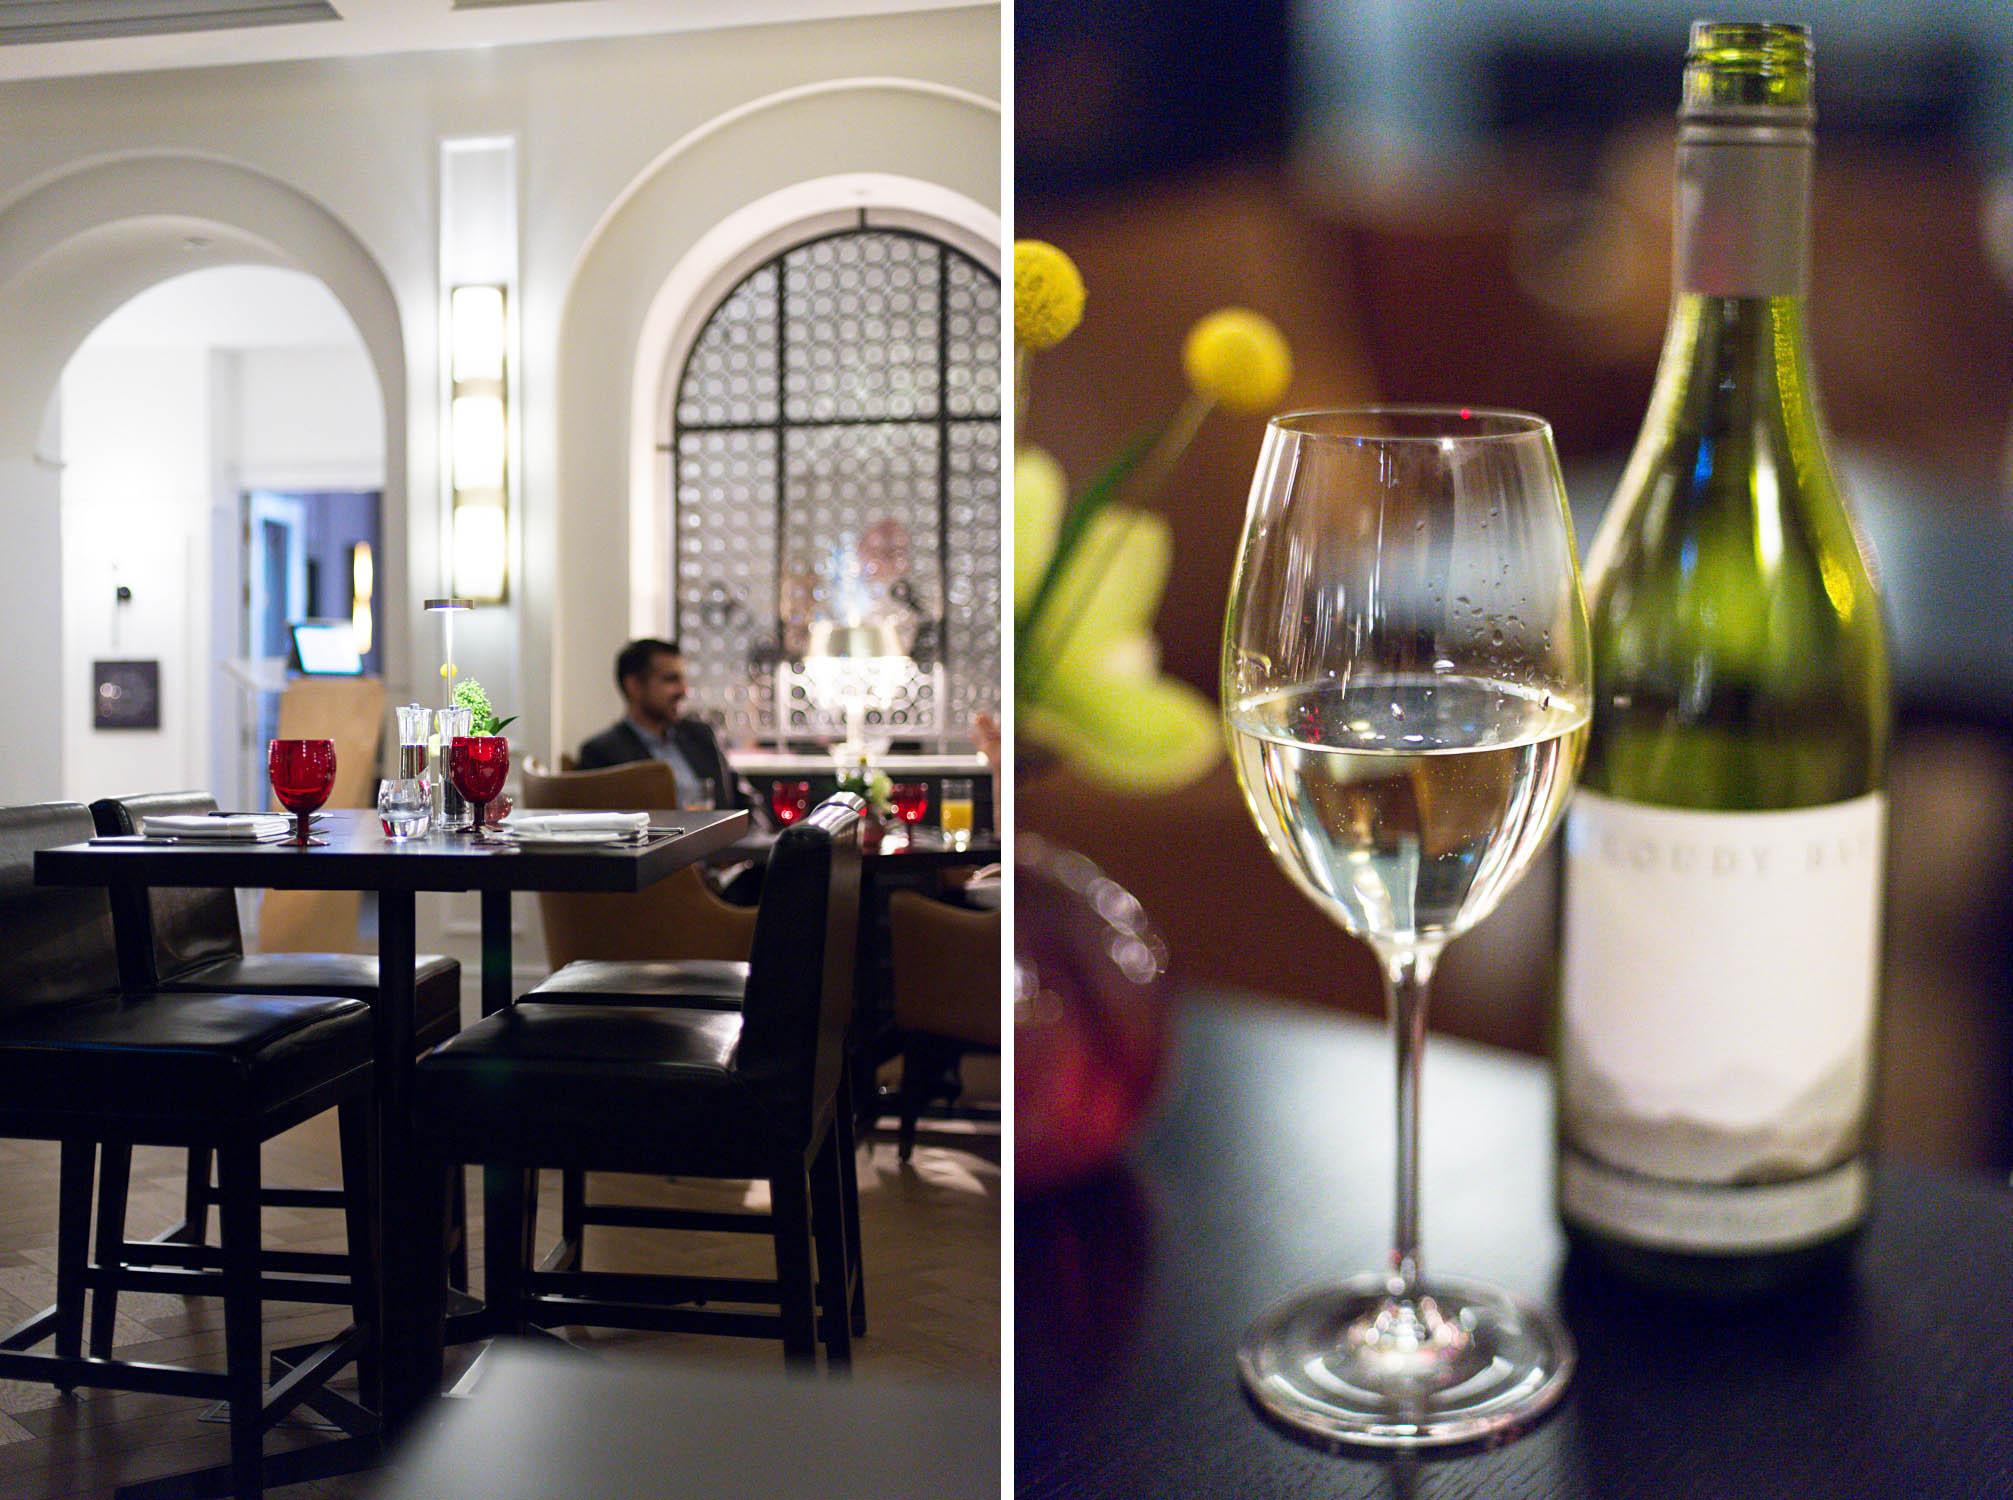 Johann Lafer Restaurant at The Gainsborough Hotel in Bath